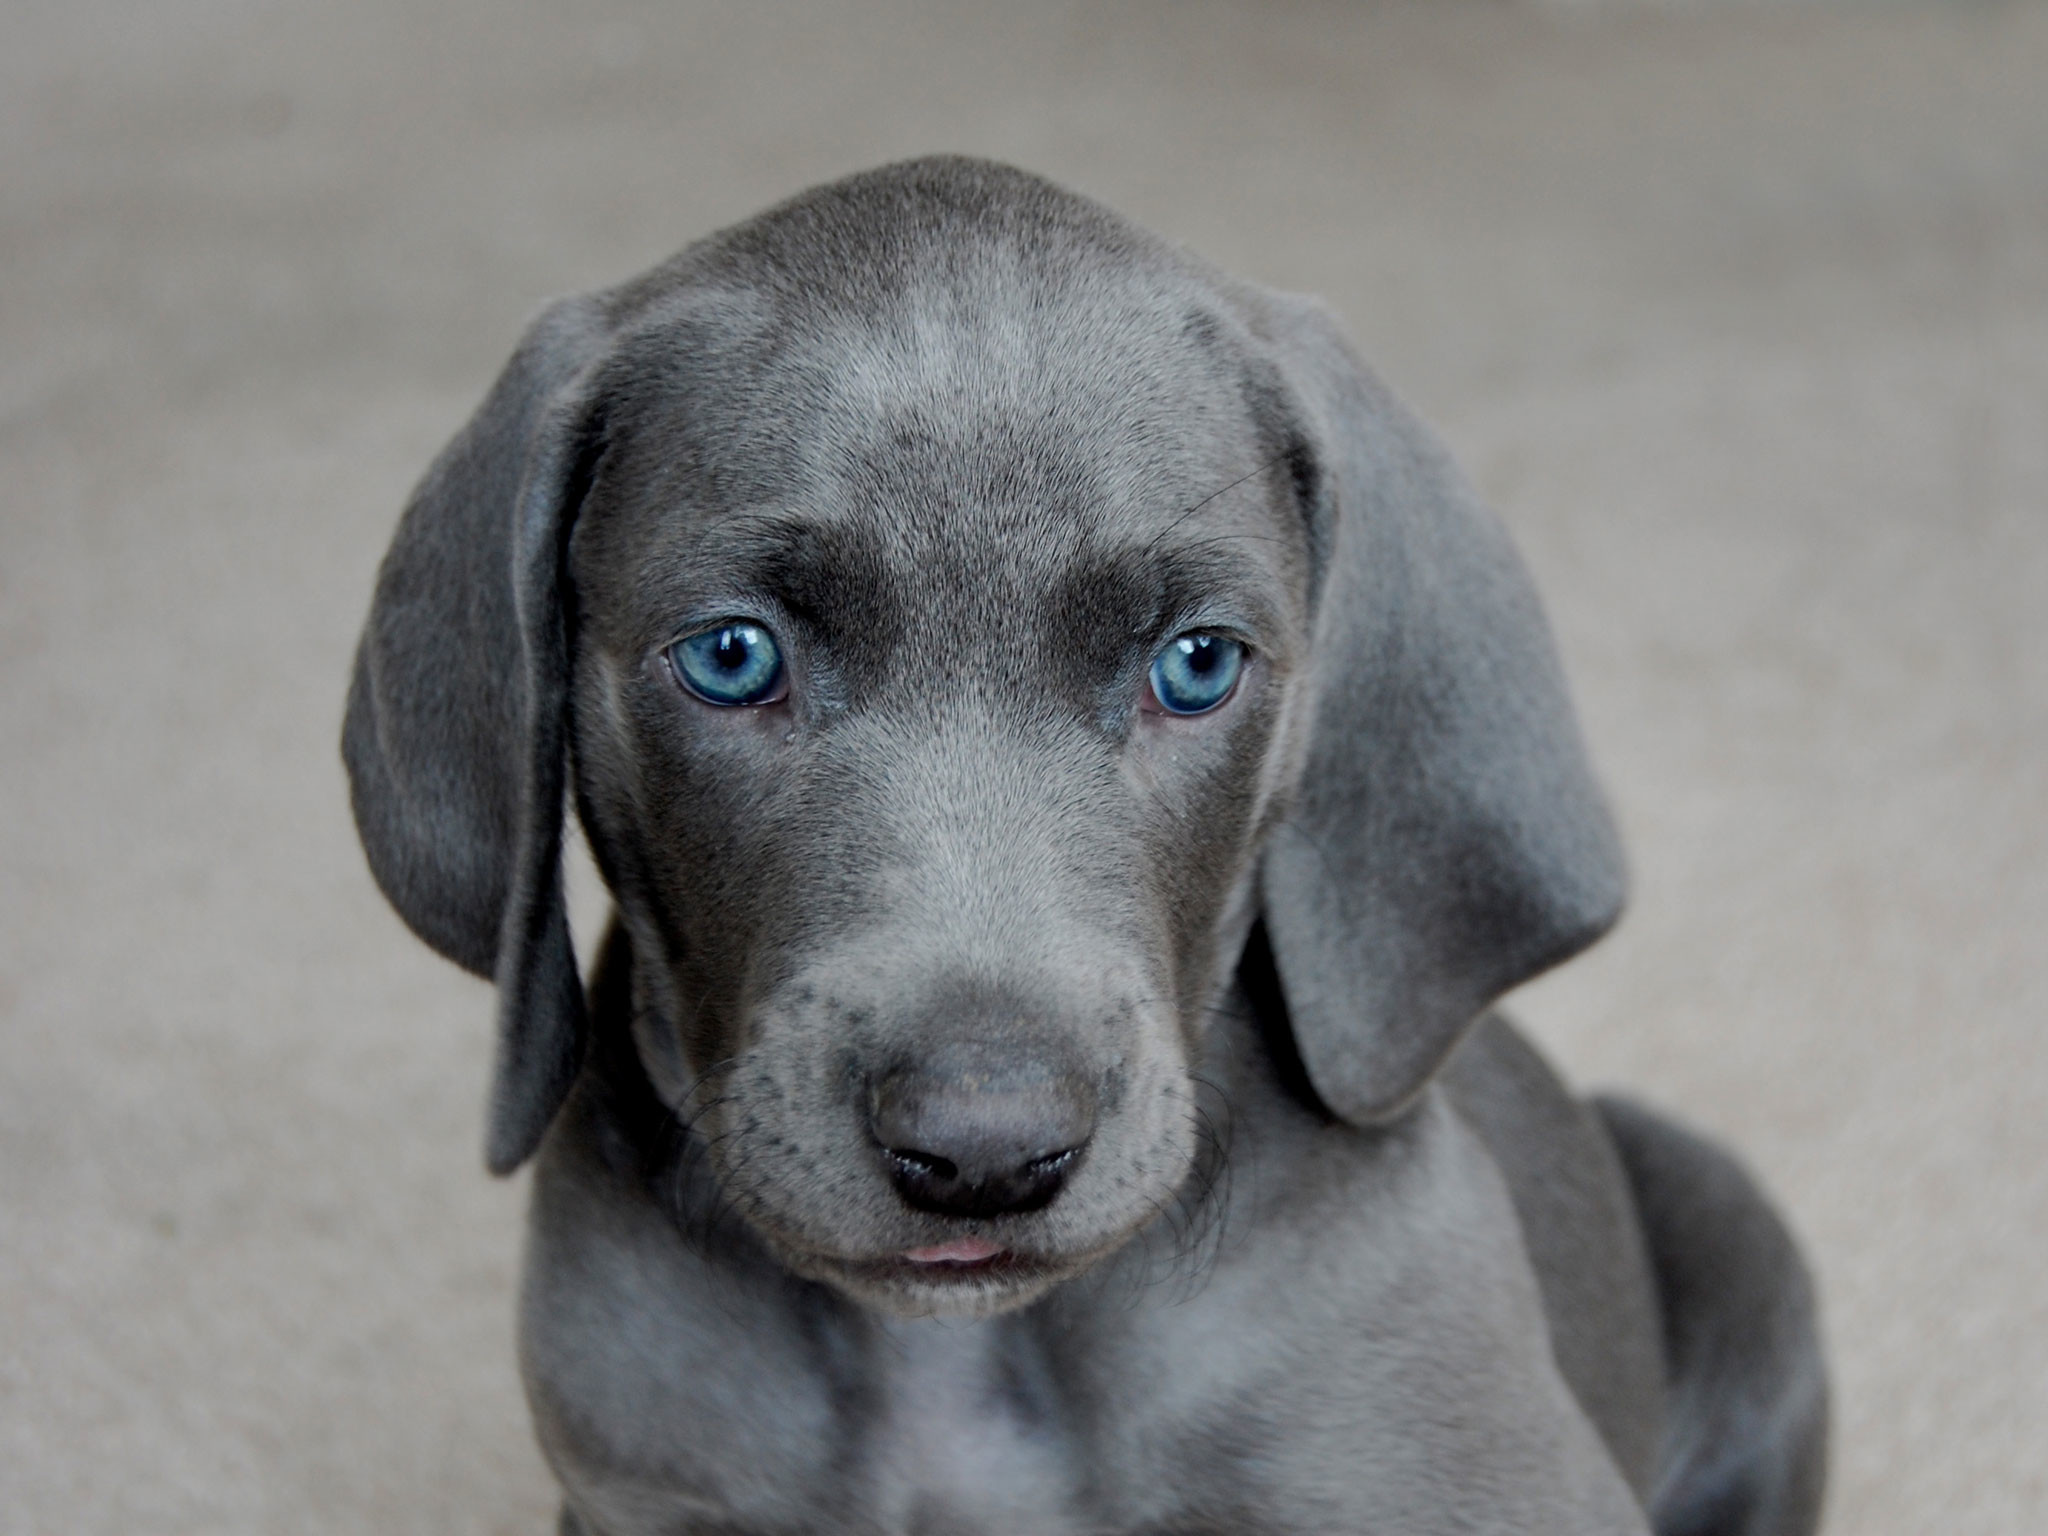 Blue Pitbull Puppies Wallpaper | HD Desktop Wallpaper